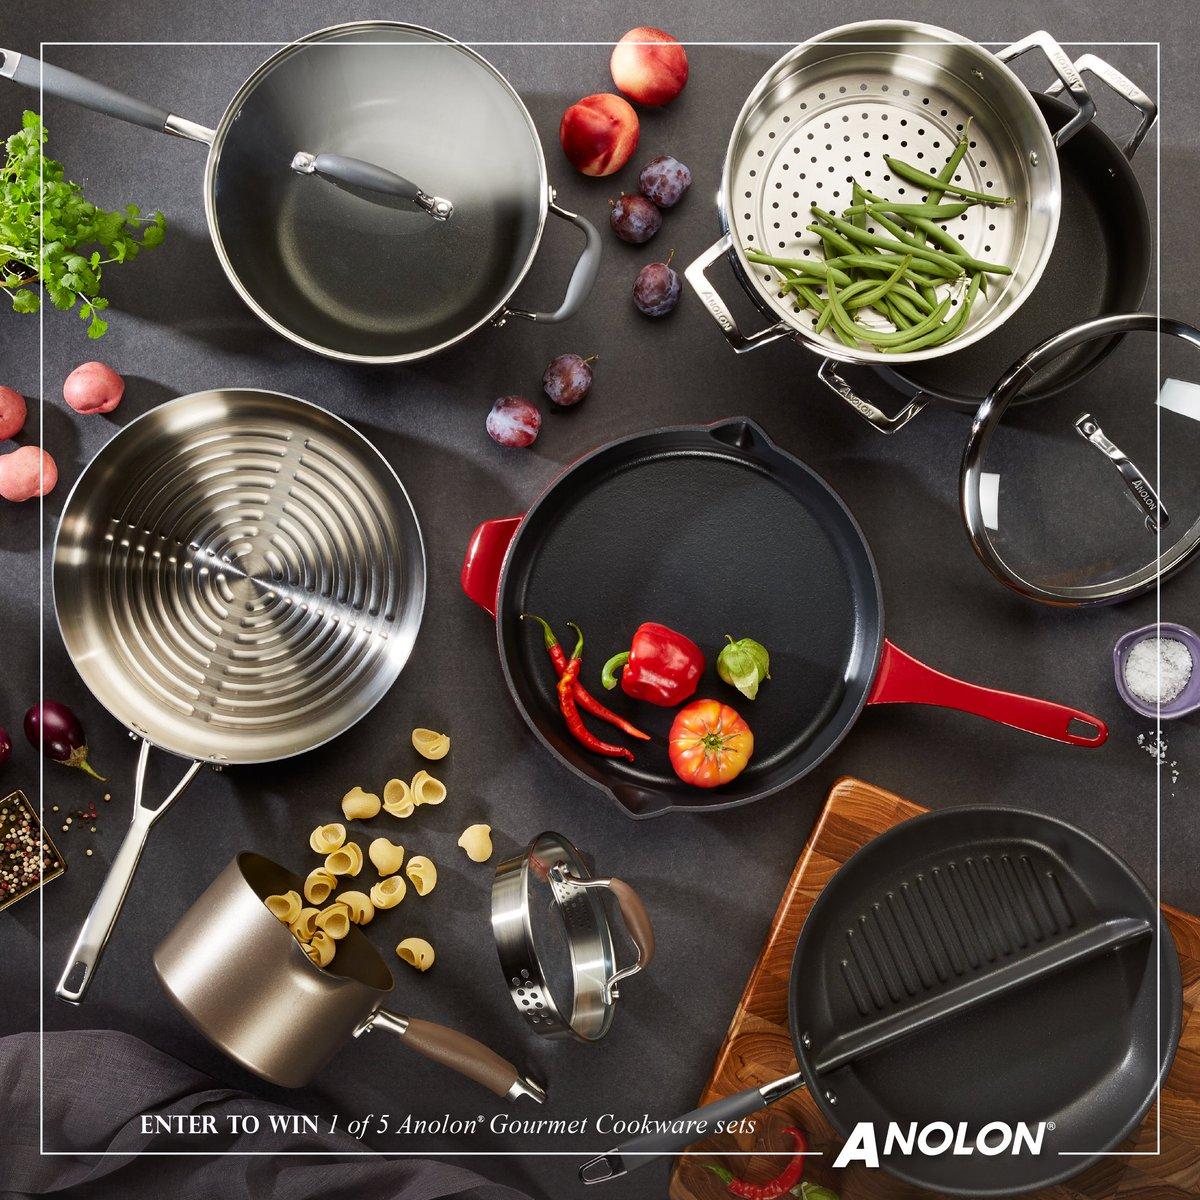 Ends 10/10 >> RT to share & enter to WIN 1 of 5 Anolon Gourmet Cookware Sets: https://t.co/Tu2GBuqRJ7 https://t.co/yvGurUGLRf